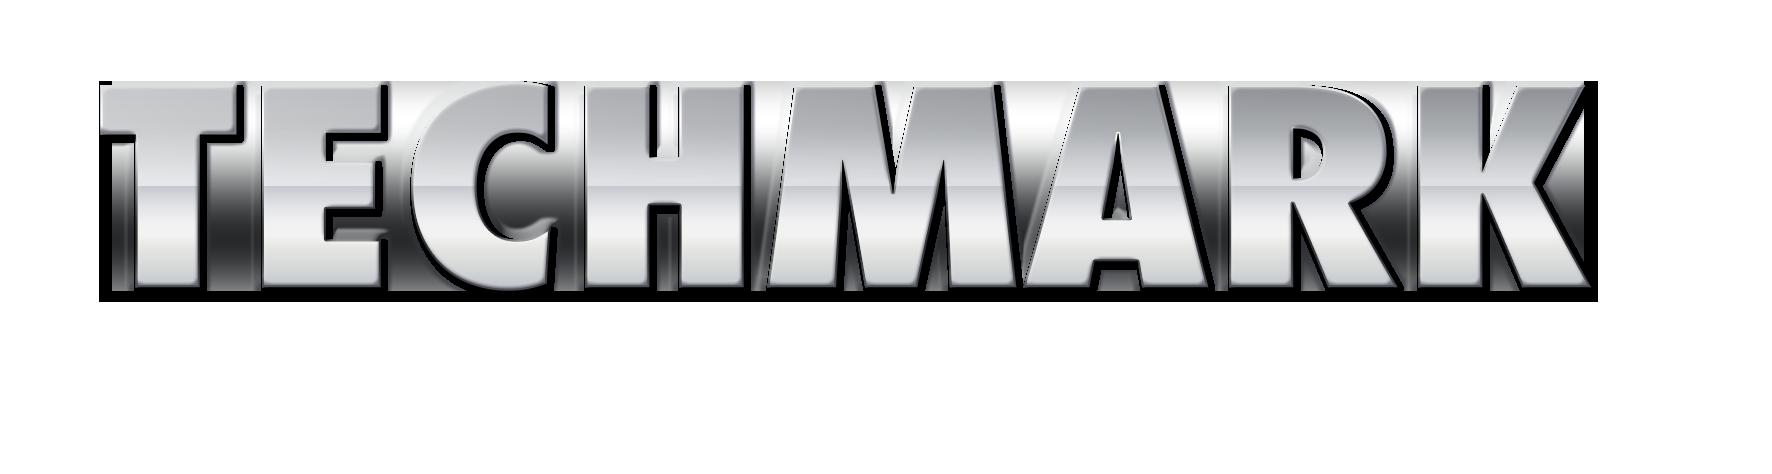 Techmark-logo (1)_silver.png